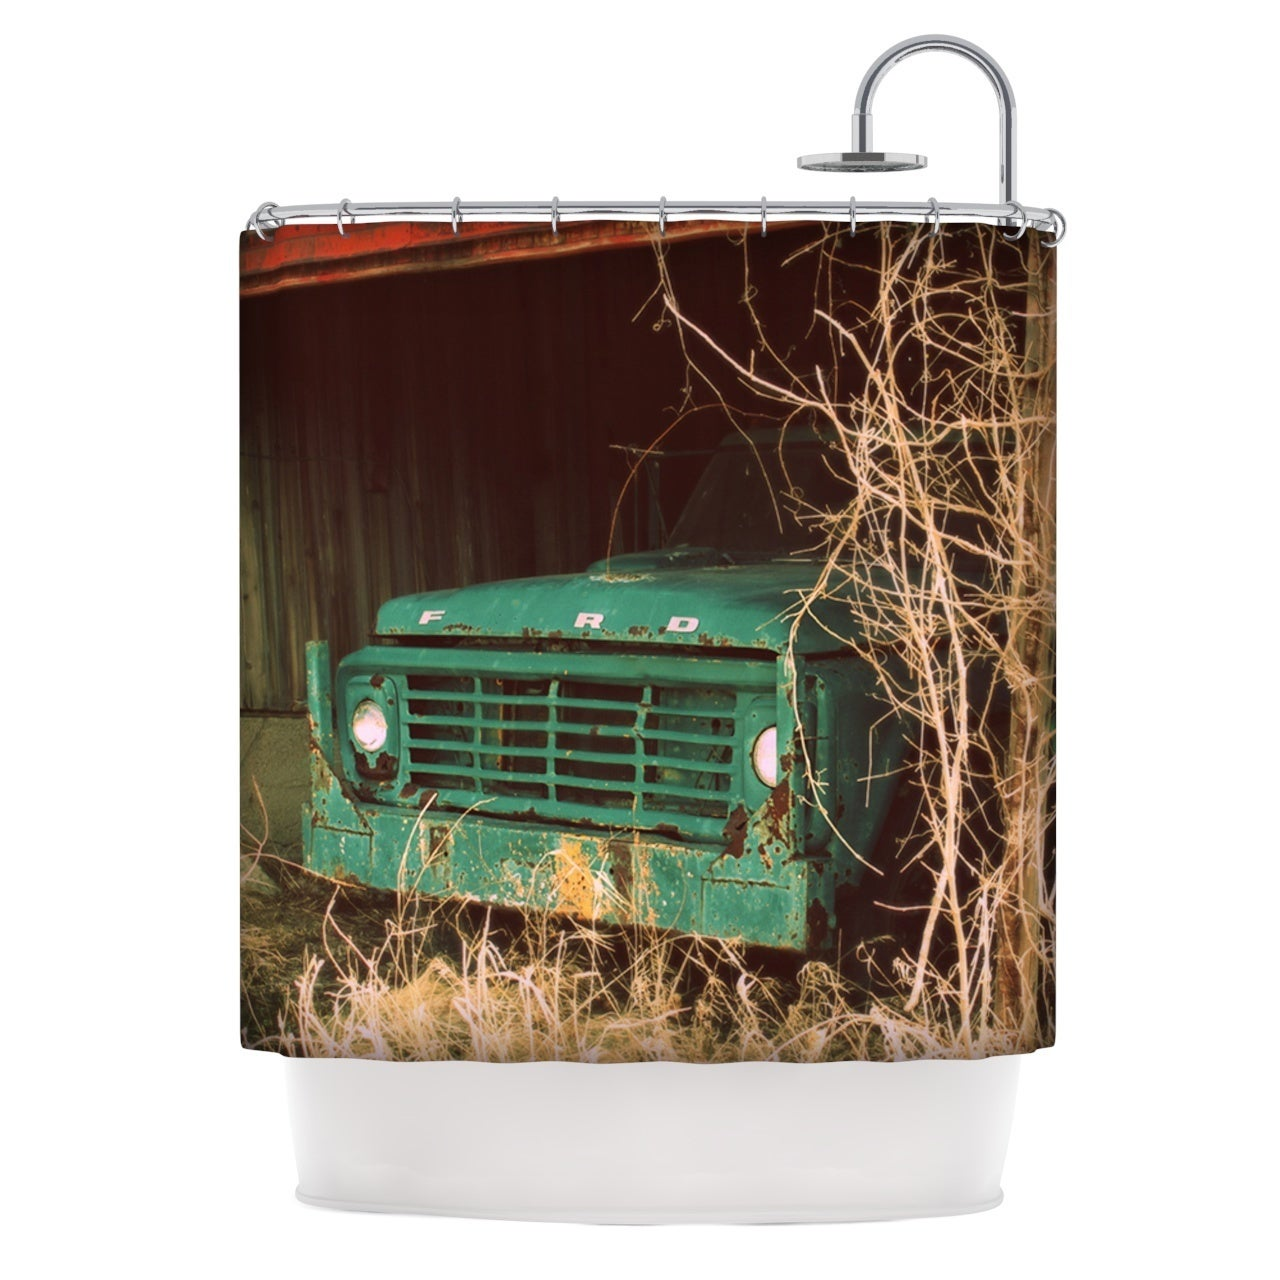 Shop KESS InHouse Angie Turner Ford Teal Car Shower Curtain 69x70